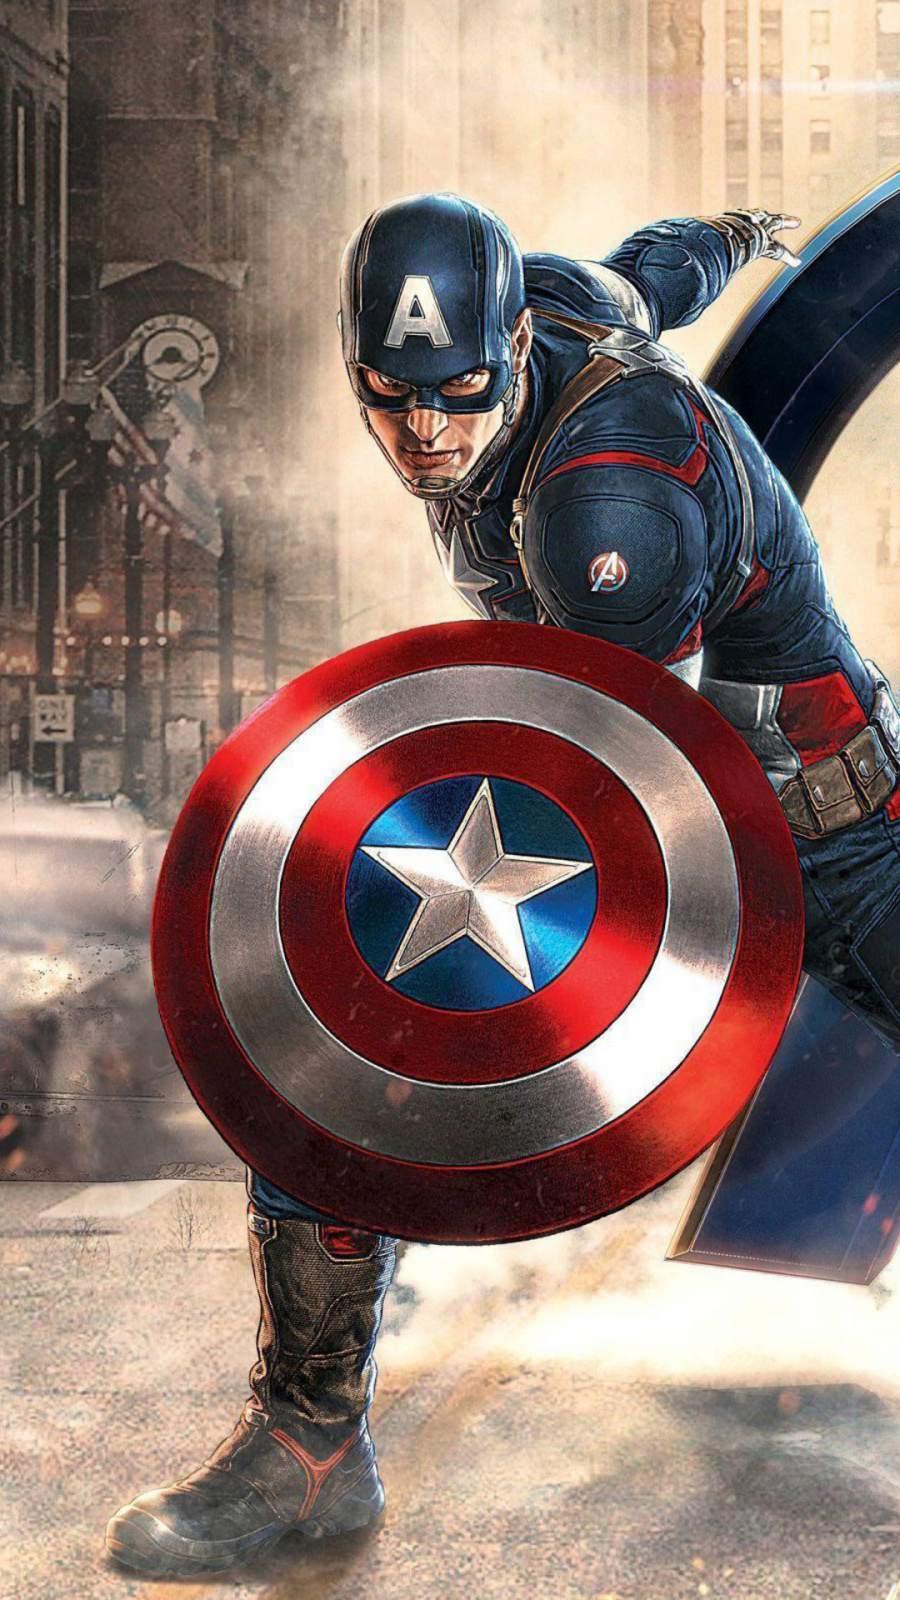 Captain America Avengers Artwork iPhone Wallpaper